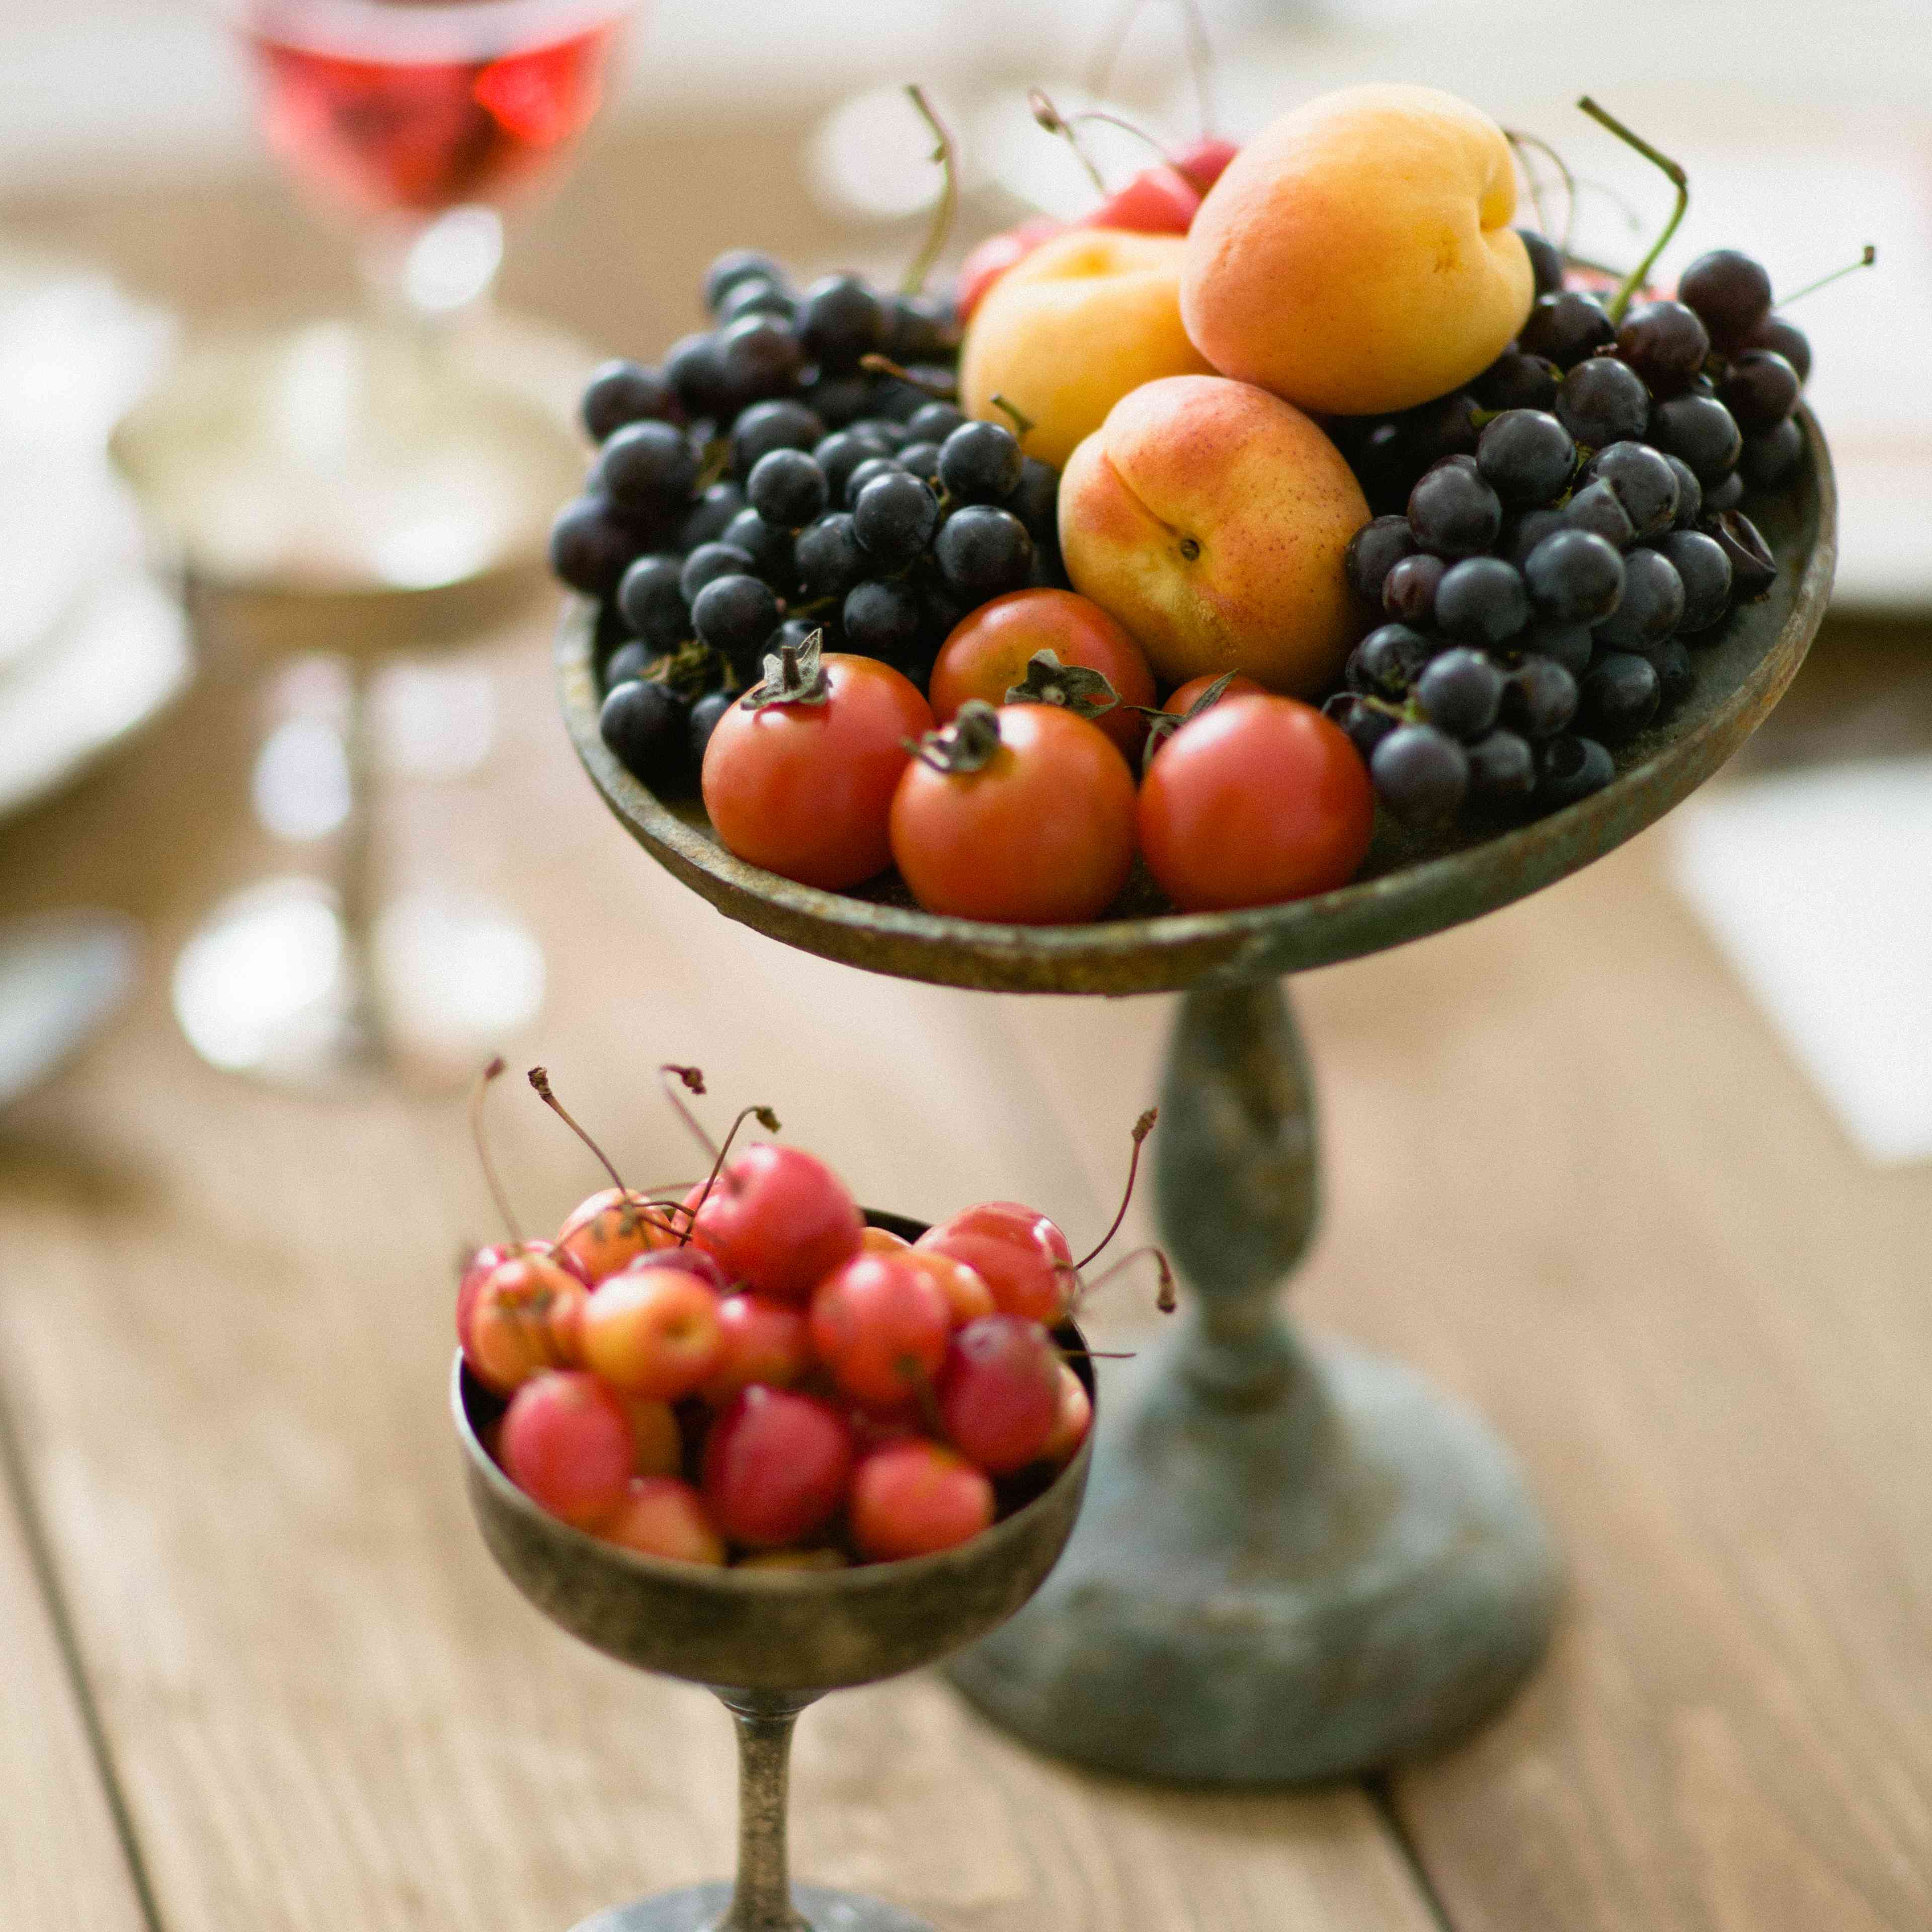 Cherries, blackberries, and apples in a metal centerpiece